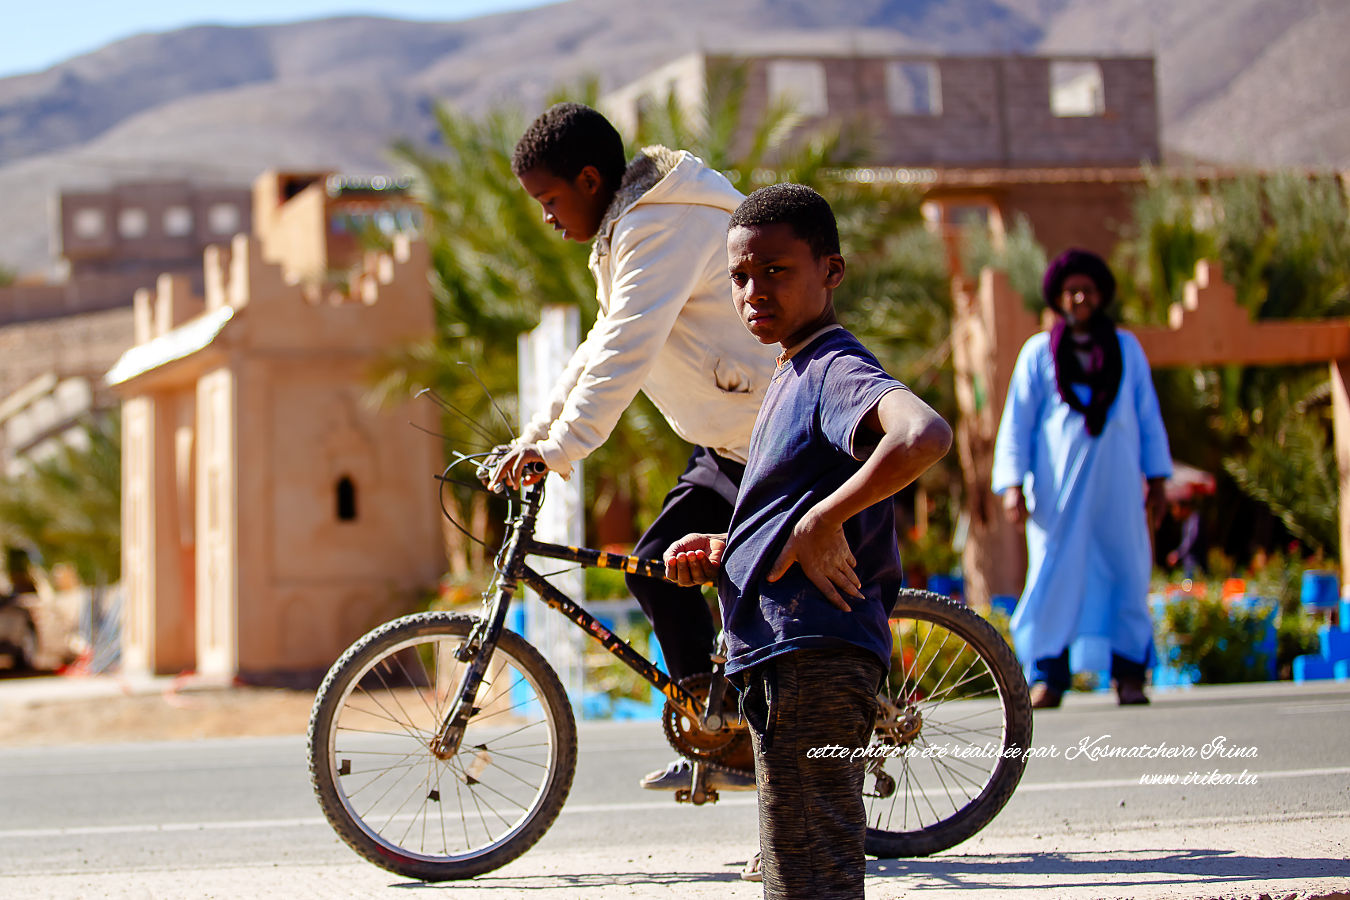 Garçons à vélo